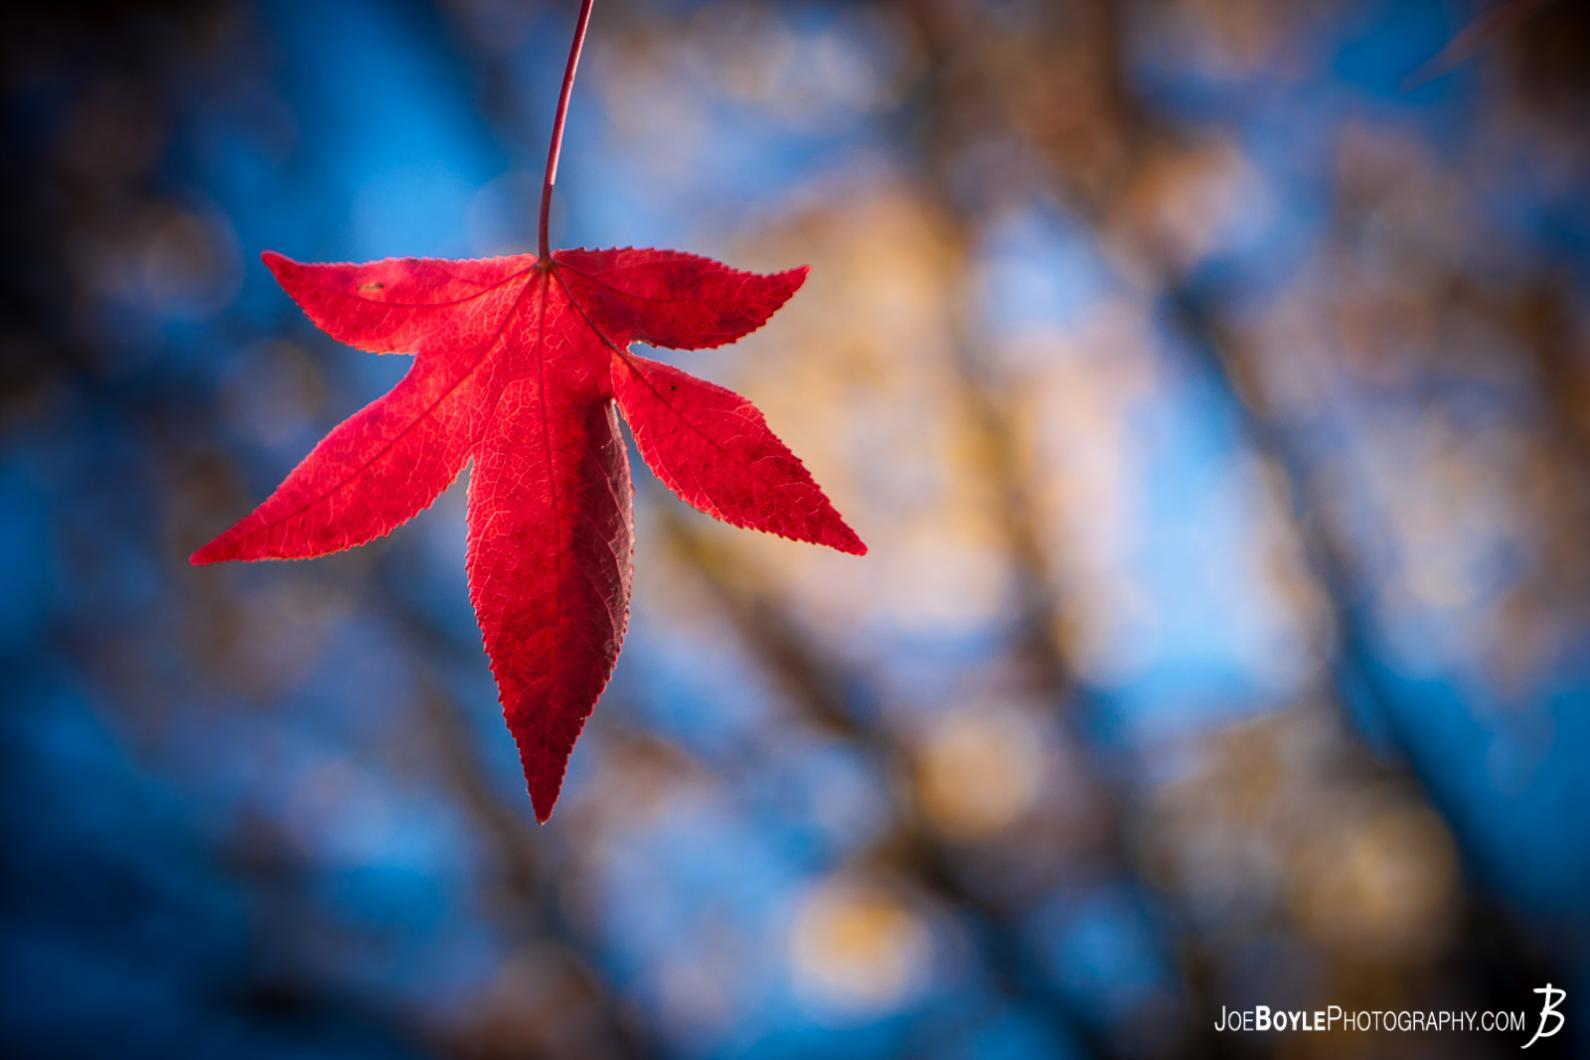 Buy u0026quot;Red Fall (Autumn) Leafu0026quot; Photo - Print Options